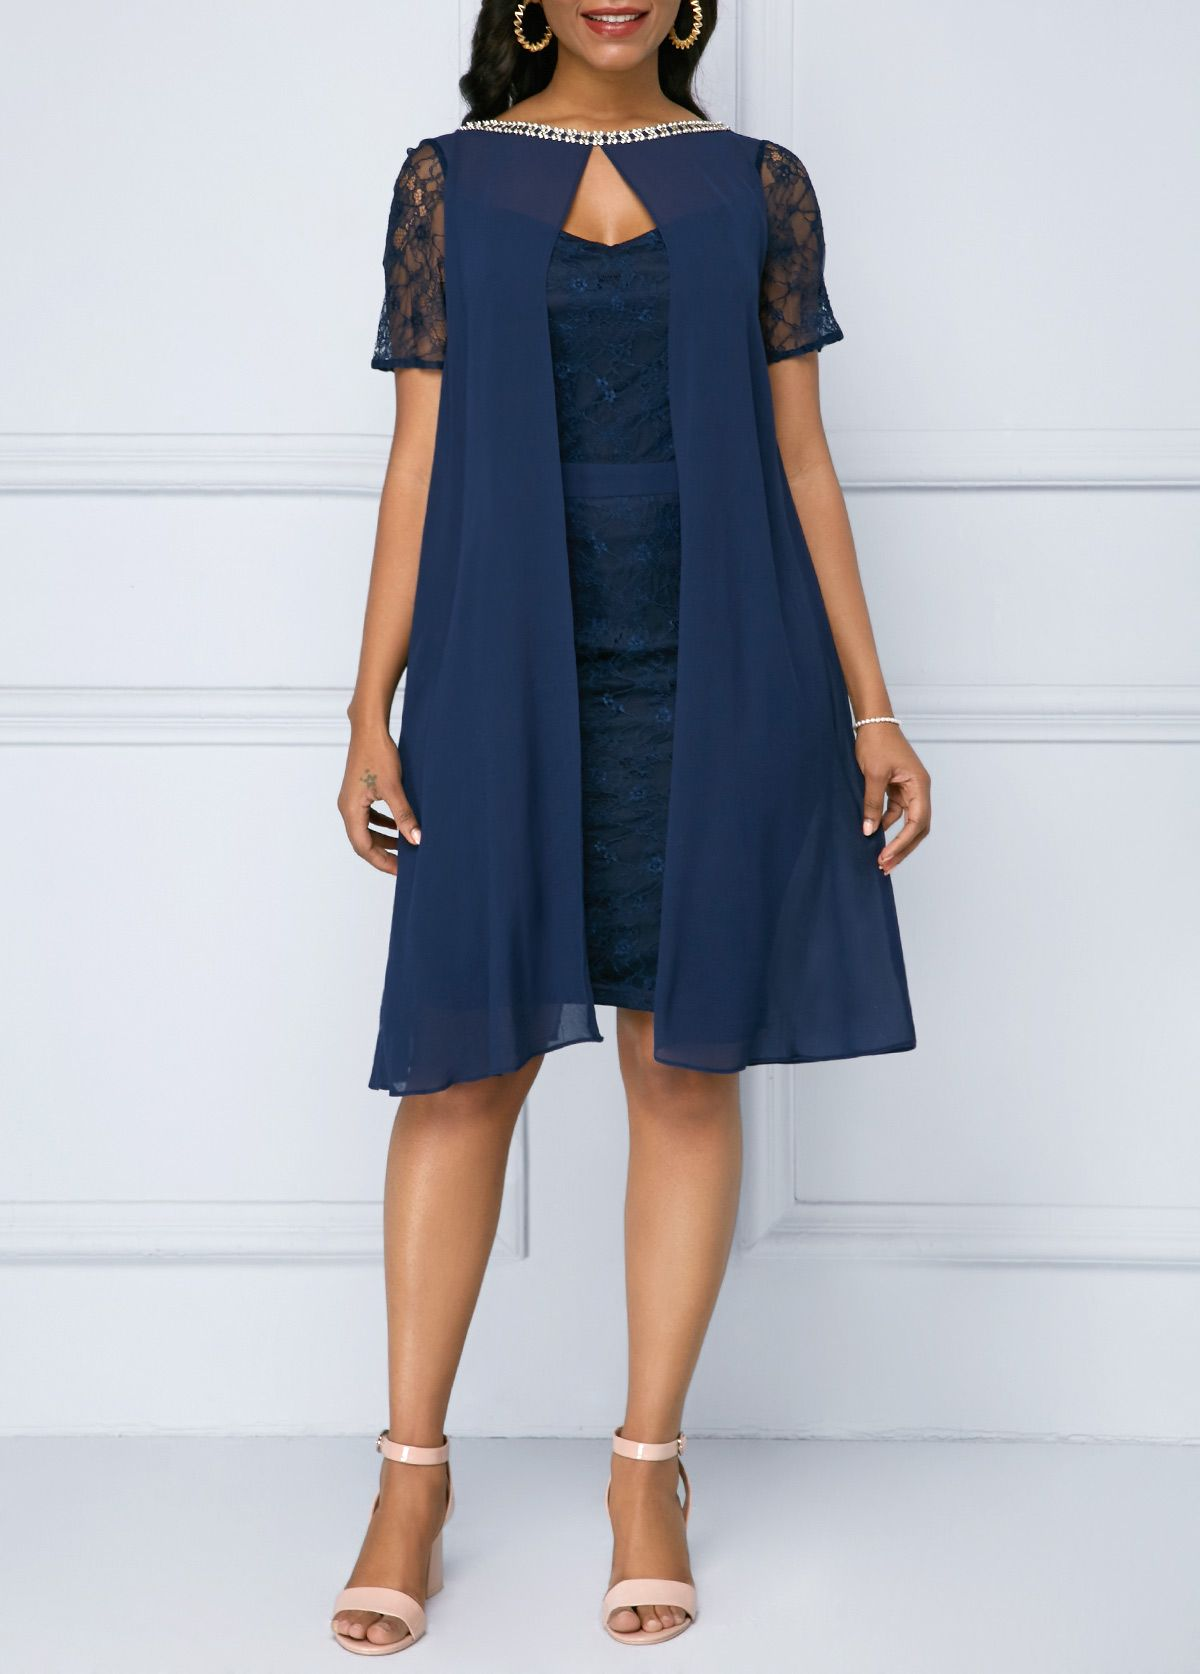 e45eedbd56e1c Embellished Neck Navy Blue Chiffon Overlay Lace Dress | Dress in ...